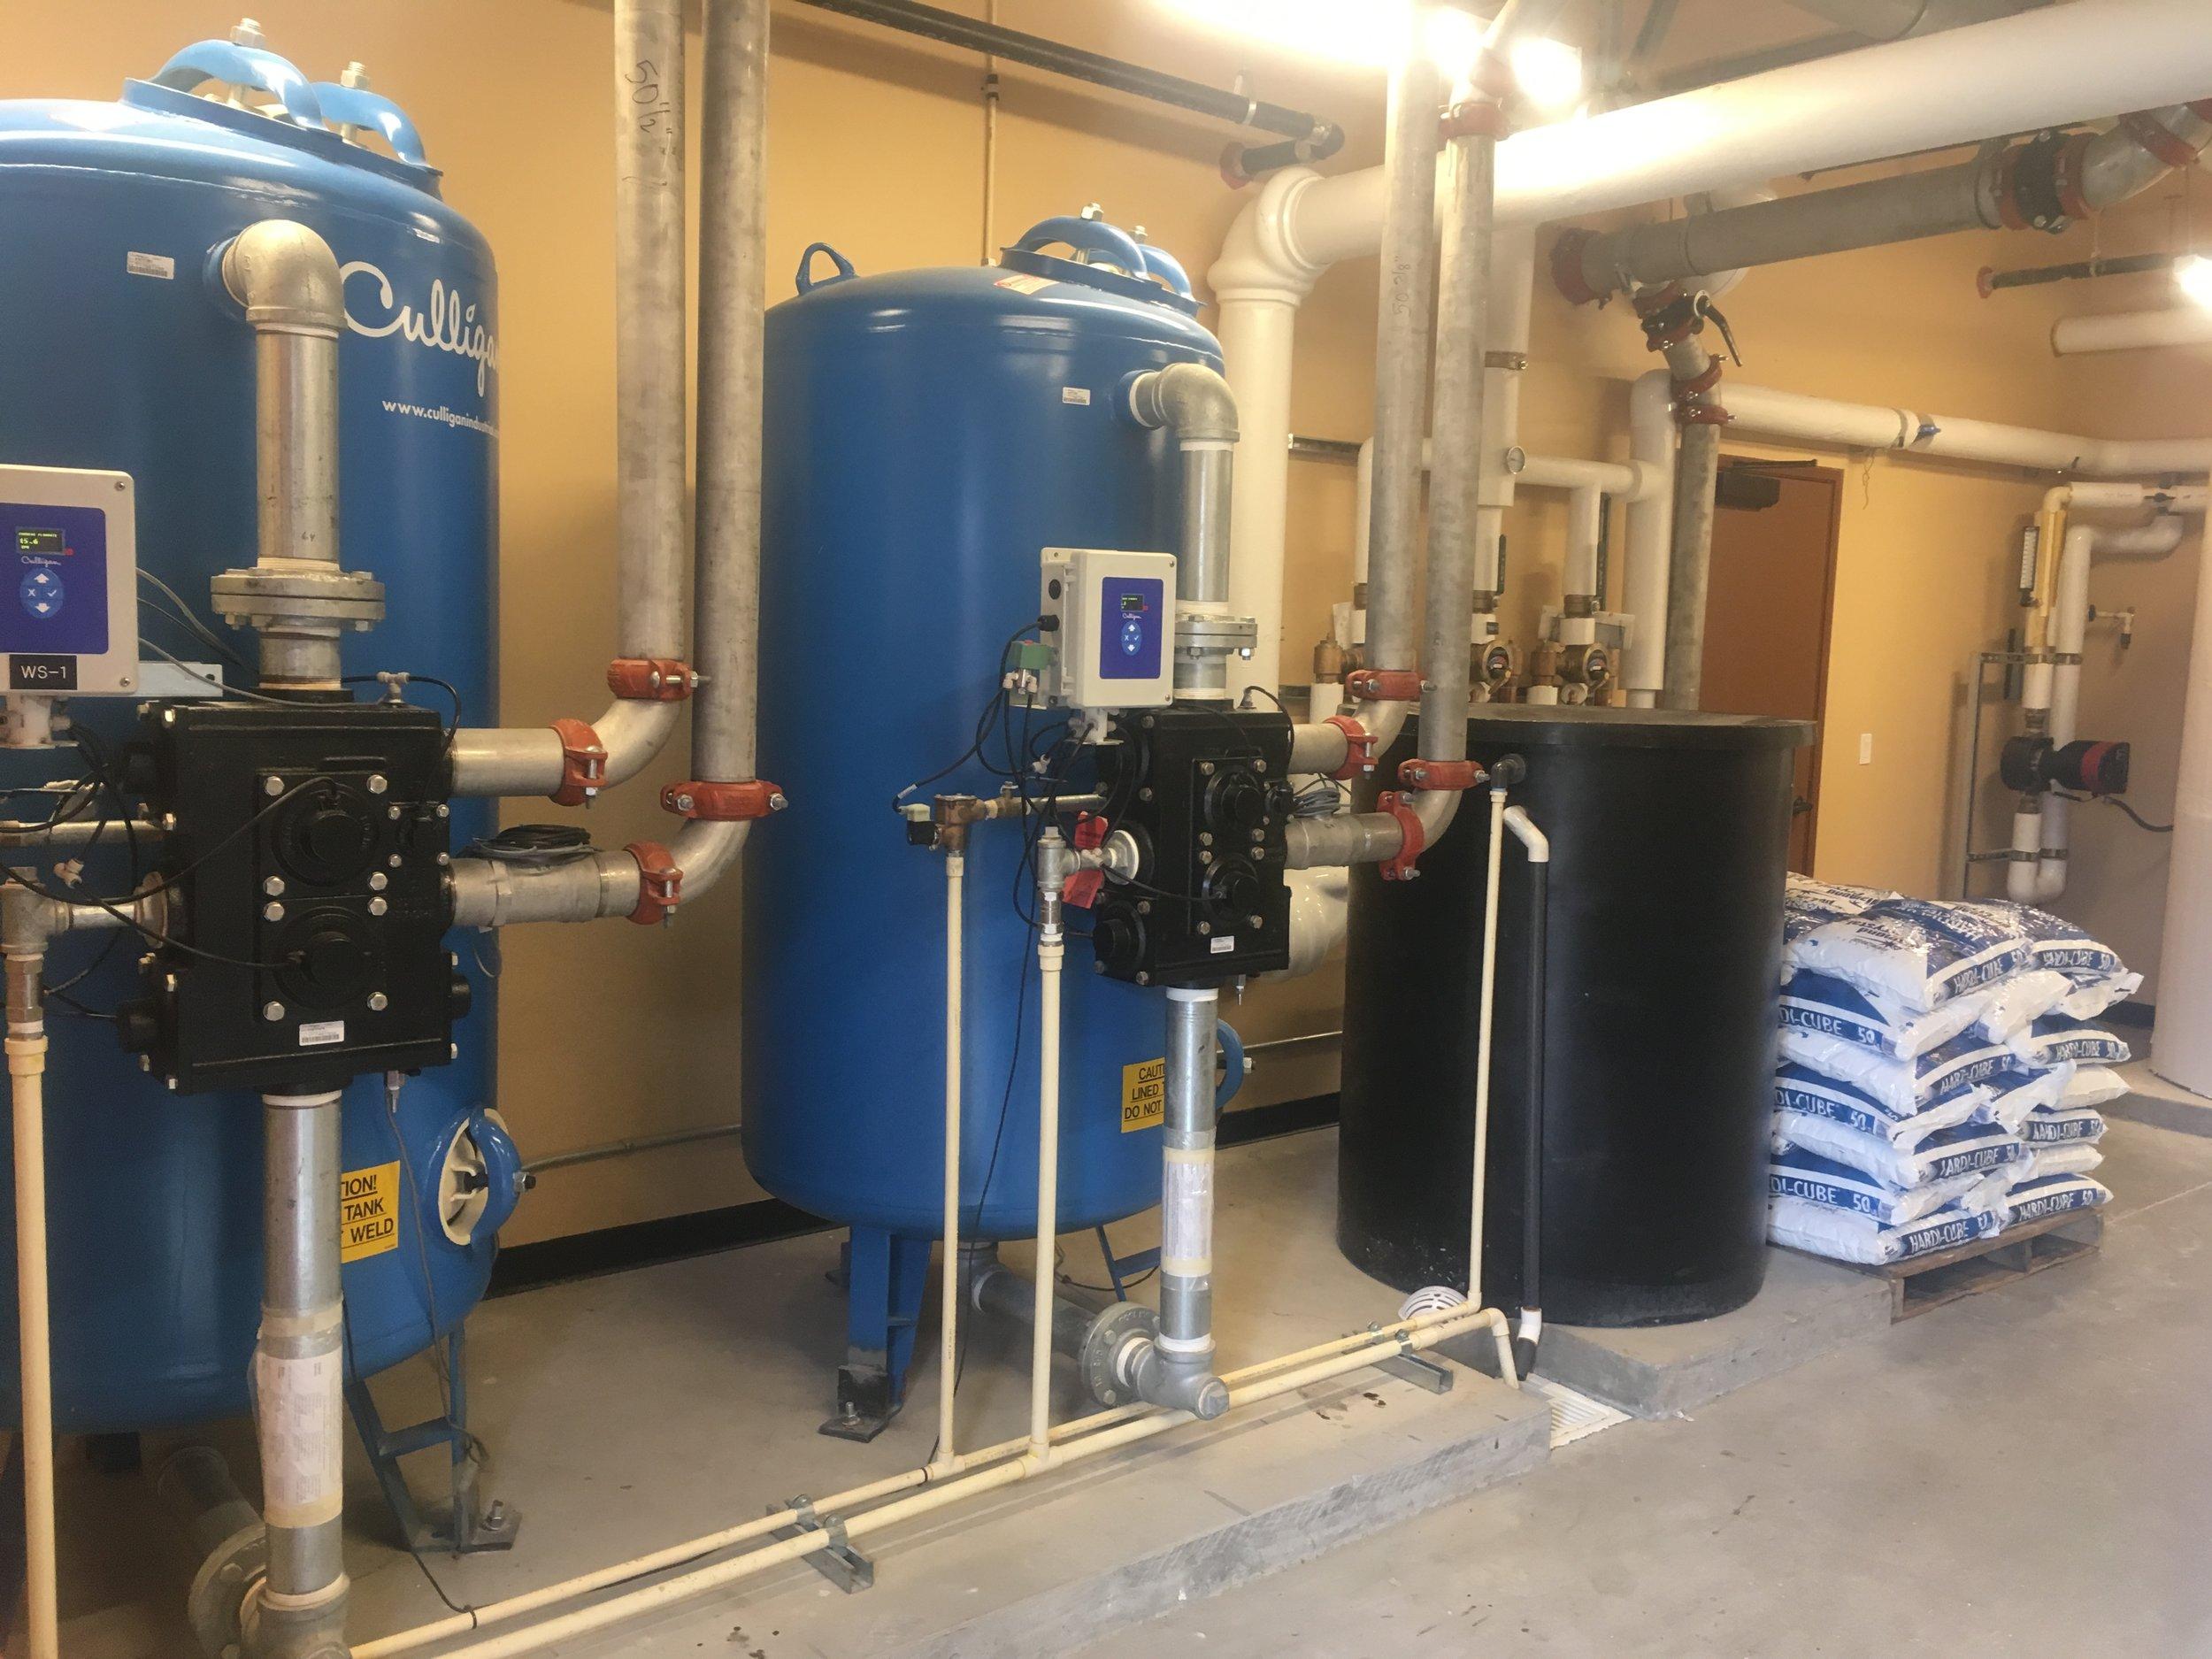 Water Softener System- Culligan.JPG